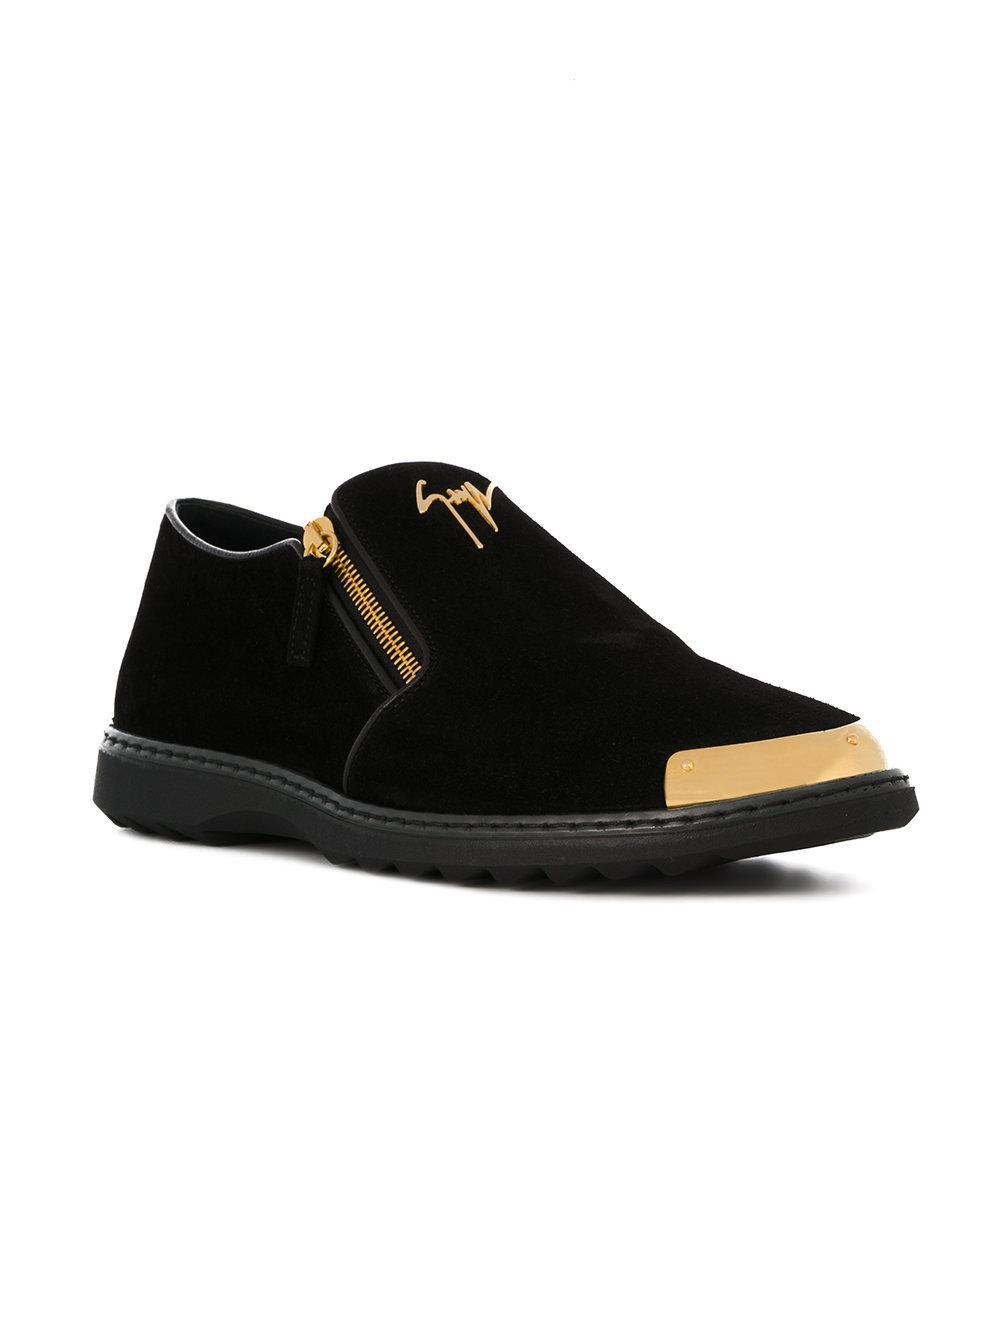 Giuseppe Zanotti Leather Cooper Loafers in Black for Men